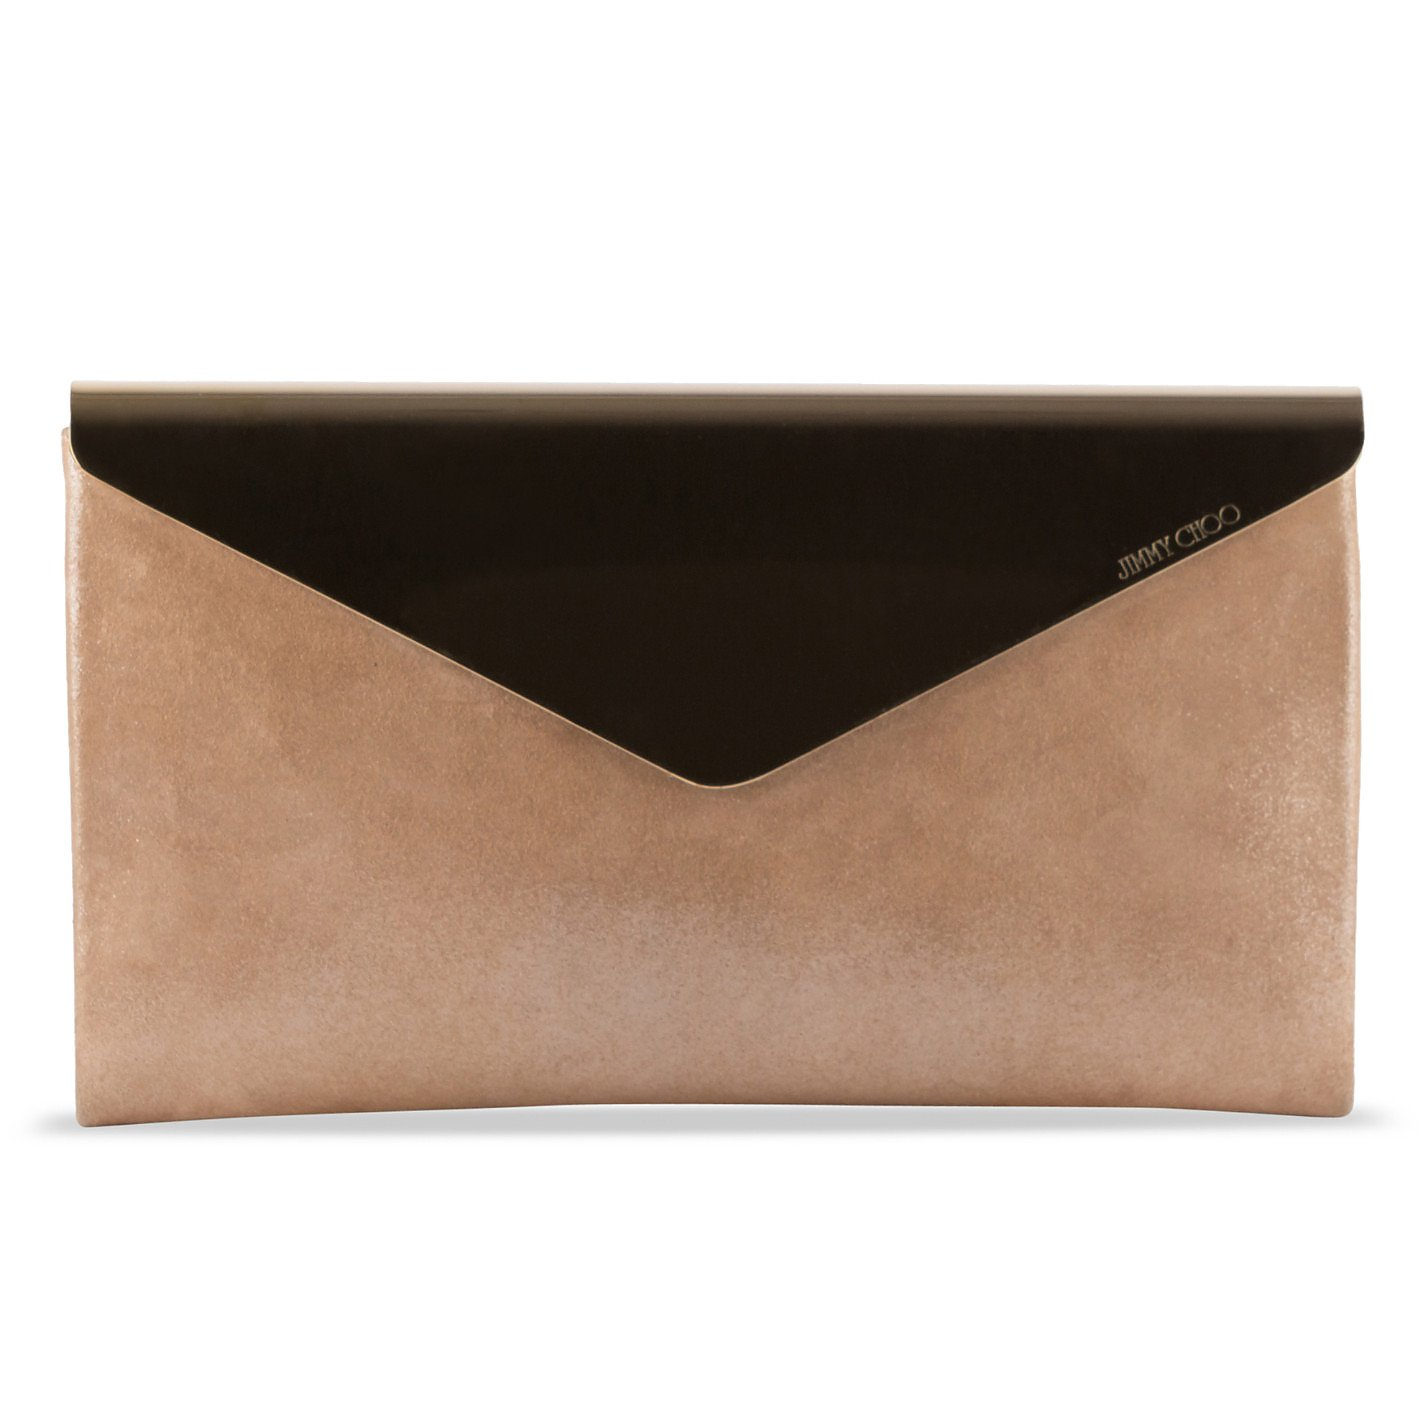 Jimmy Choo Charlize Envelope Clutch Bag